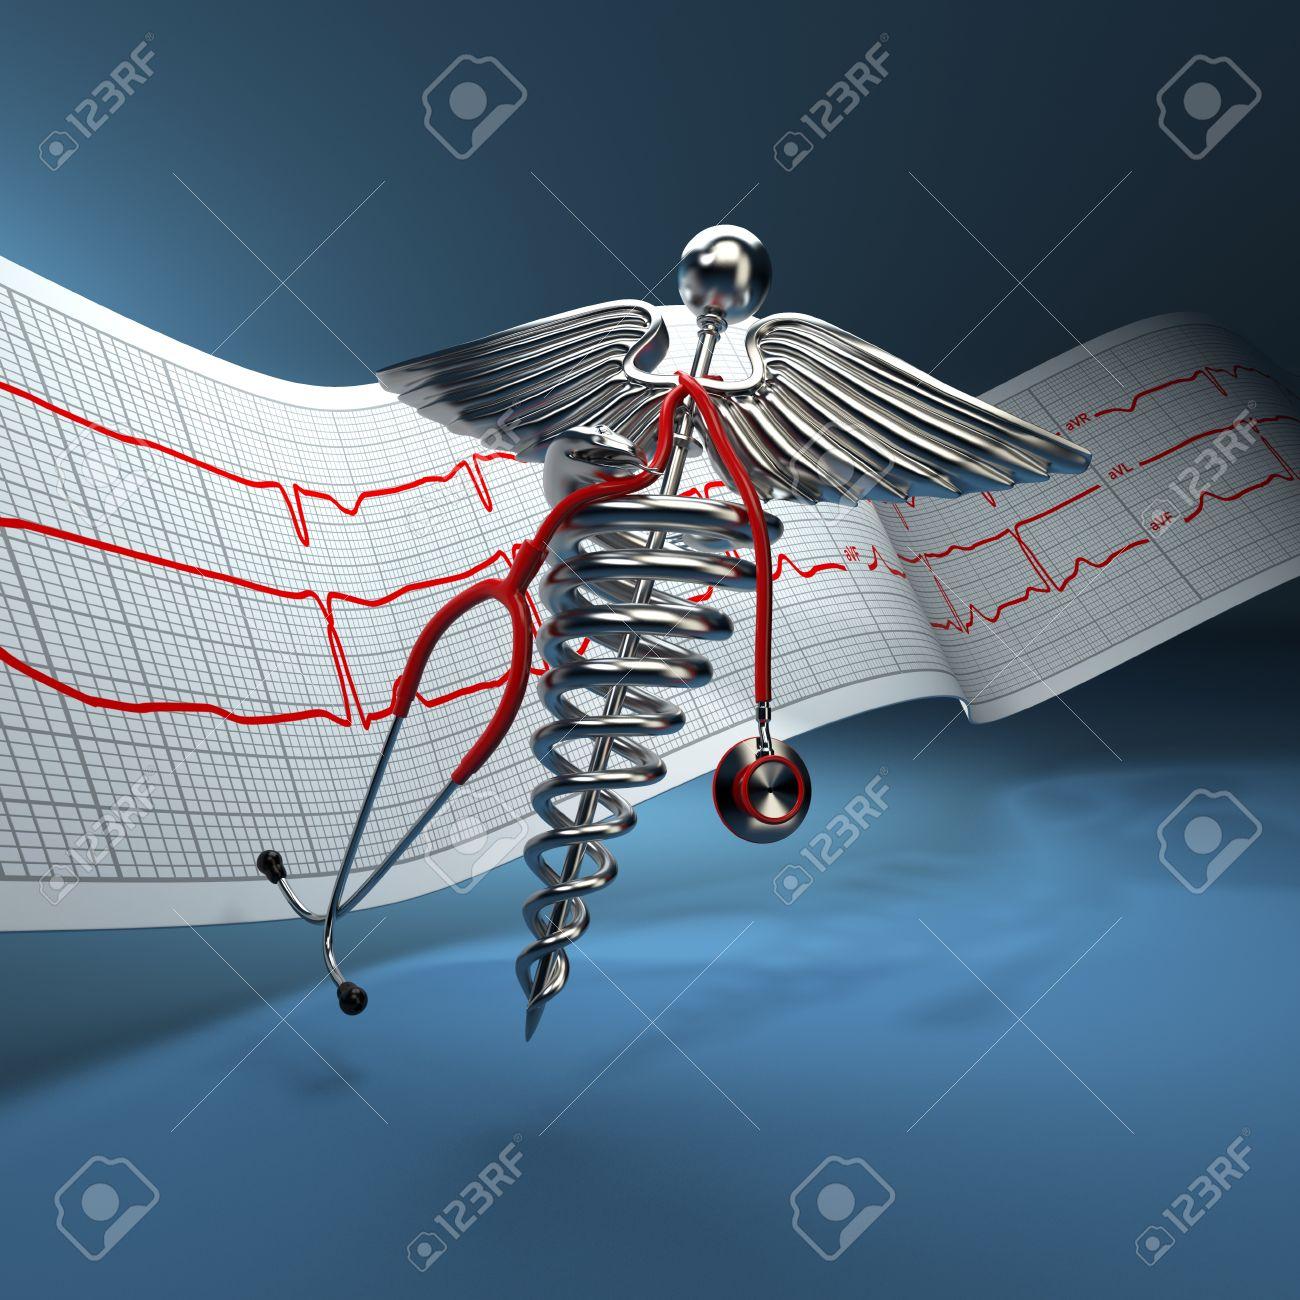 Medical background  Stethoscope, caduceus symbol  and cardiogram  3d Stock Photo - 14567004